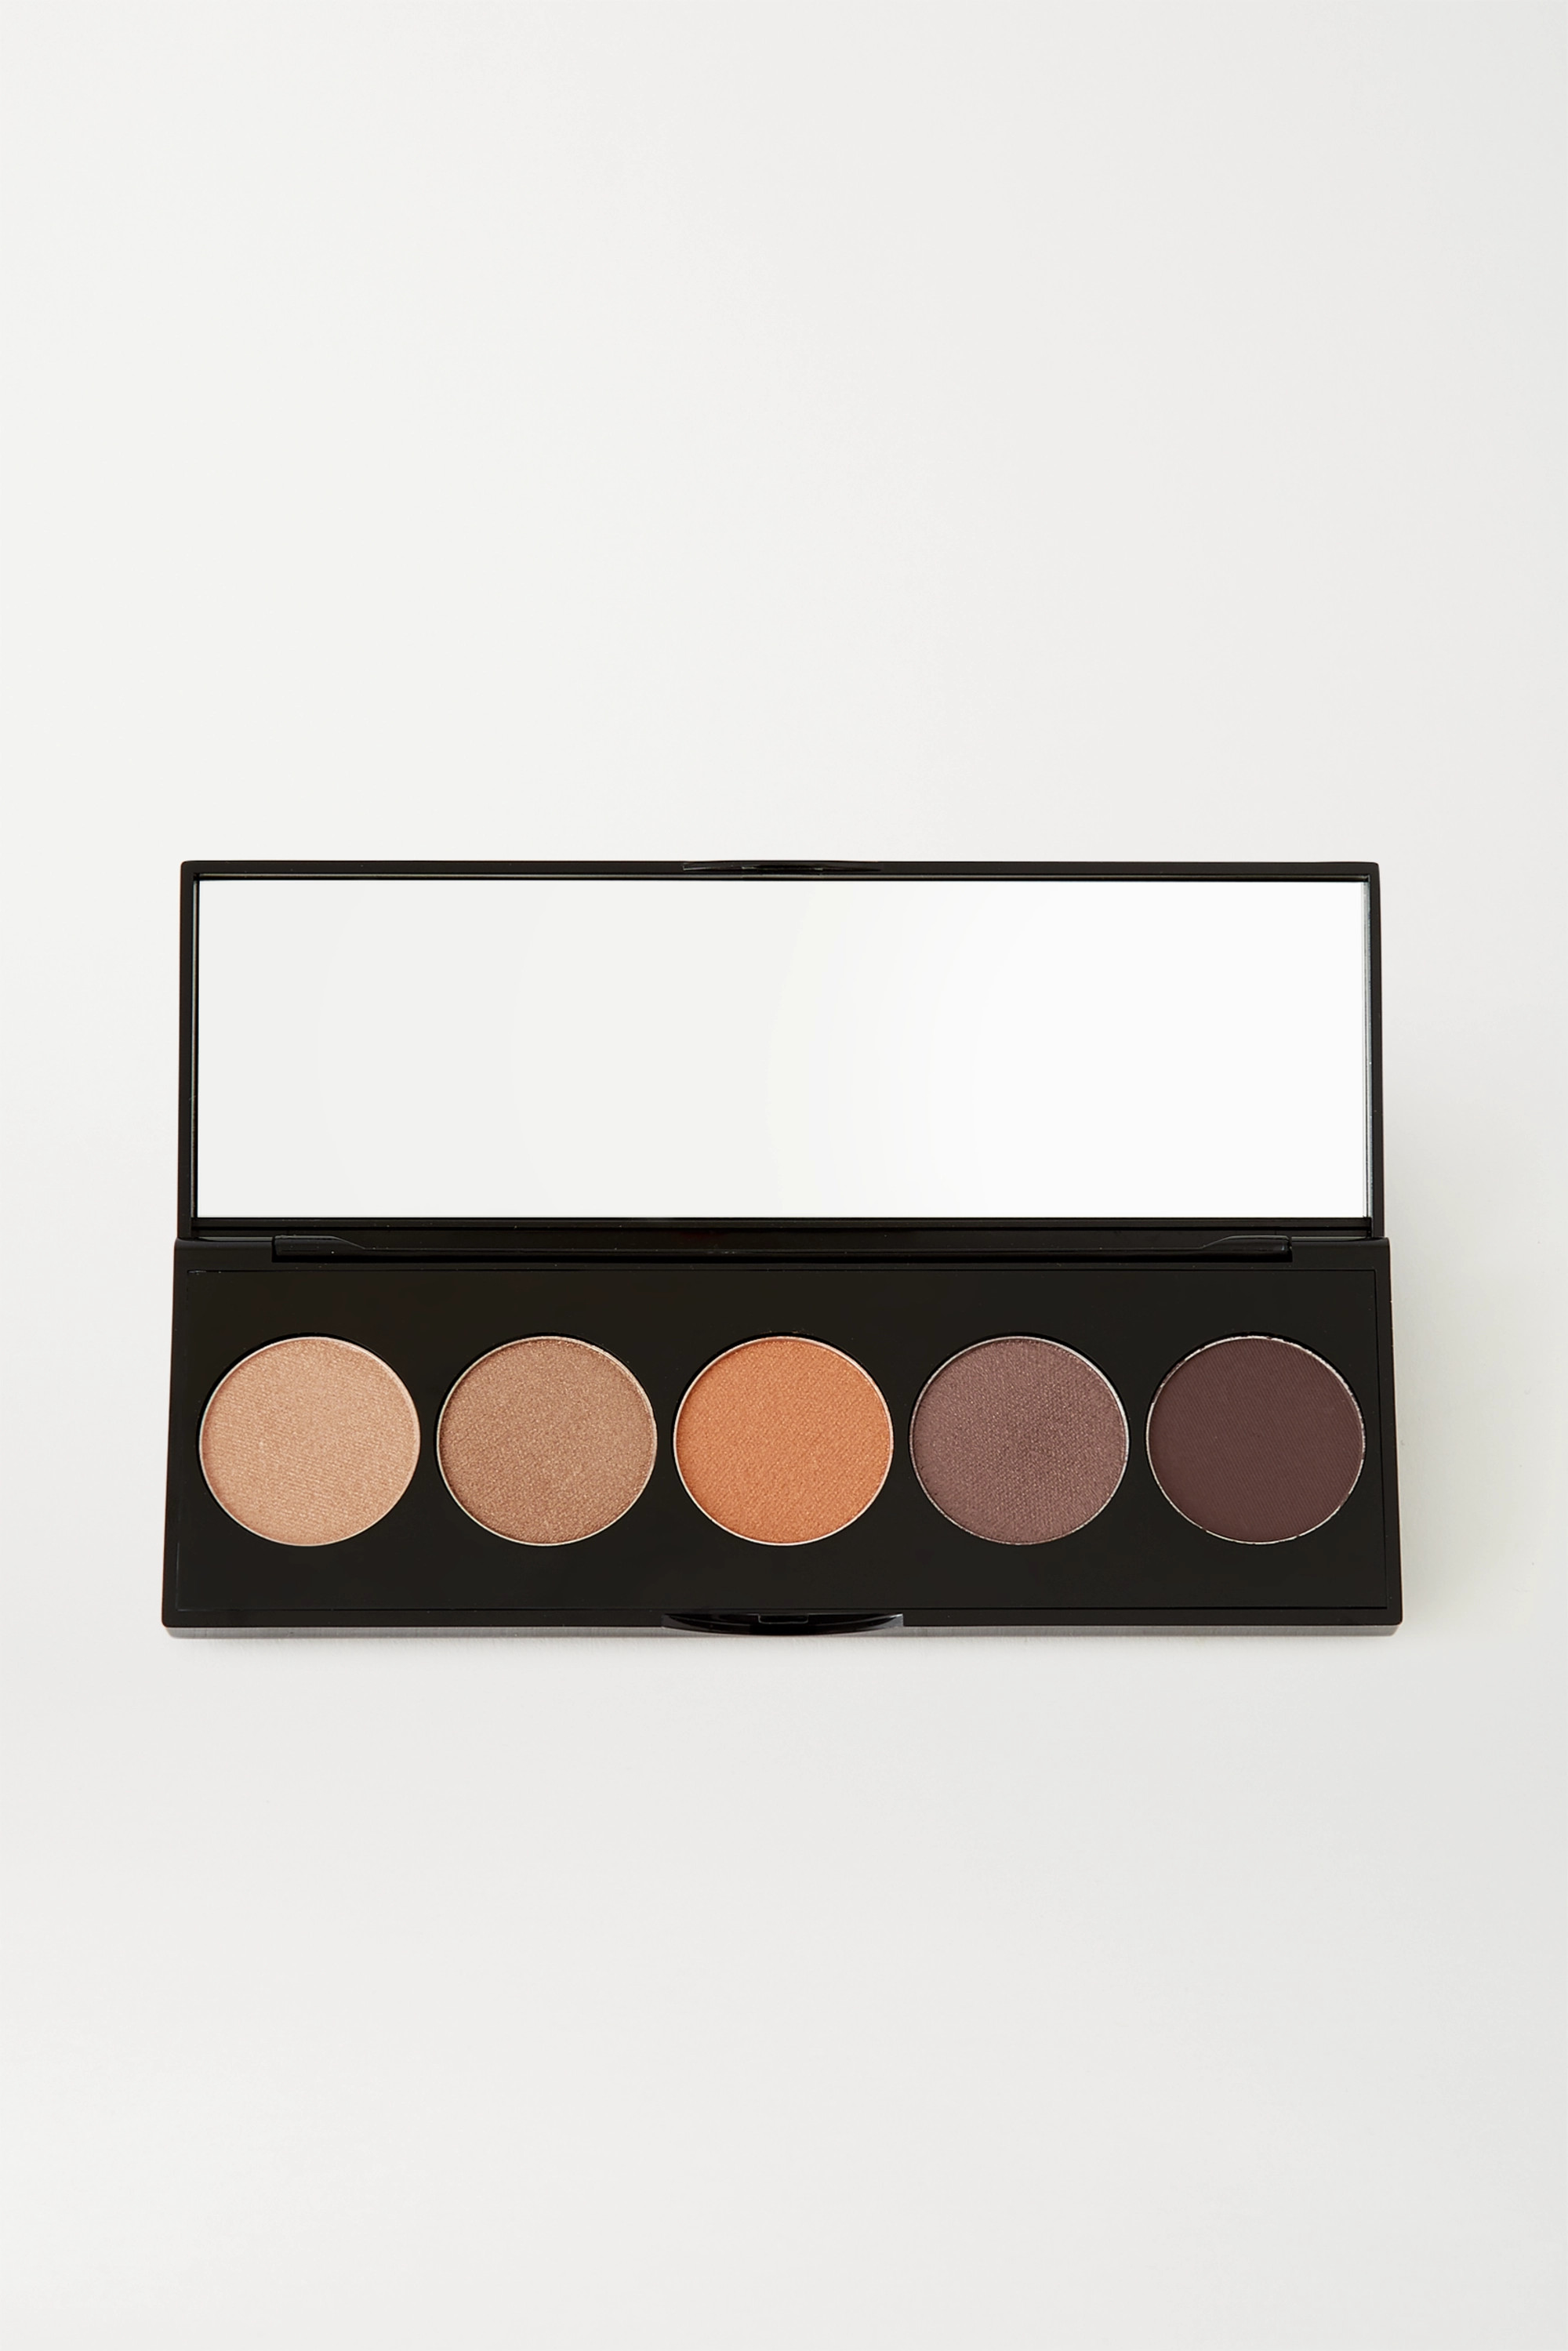 Bobbi Brown Eye Shadow Palette – Golden Nudes – Lidschattenpalette